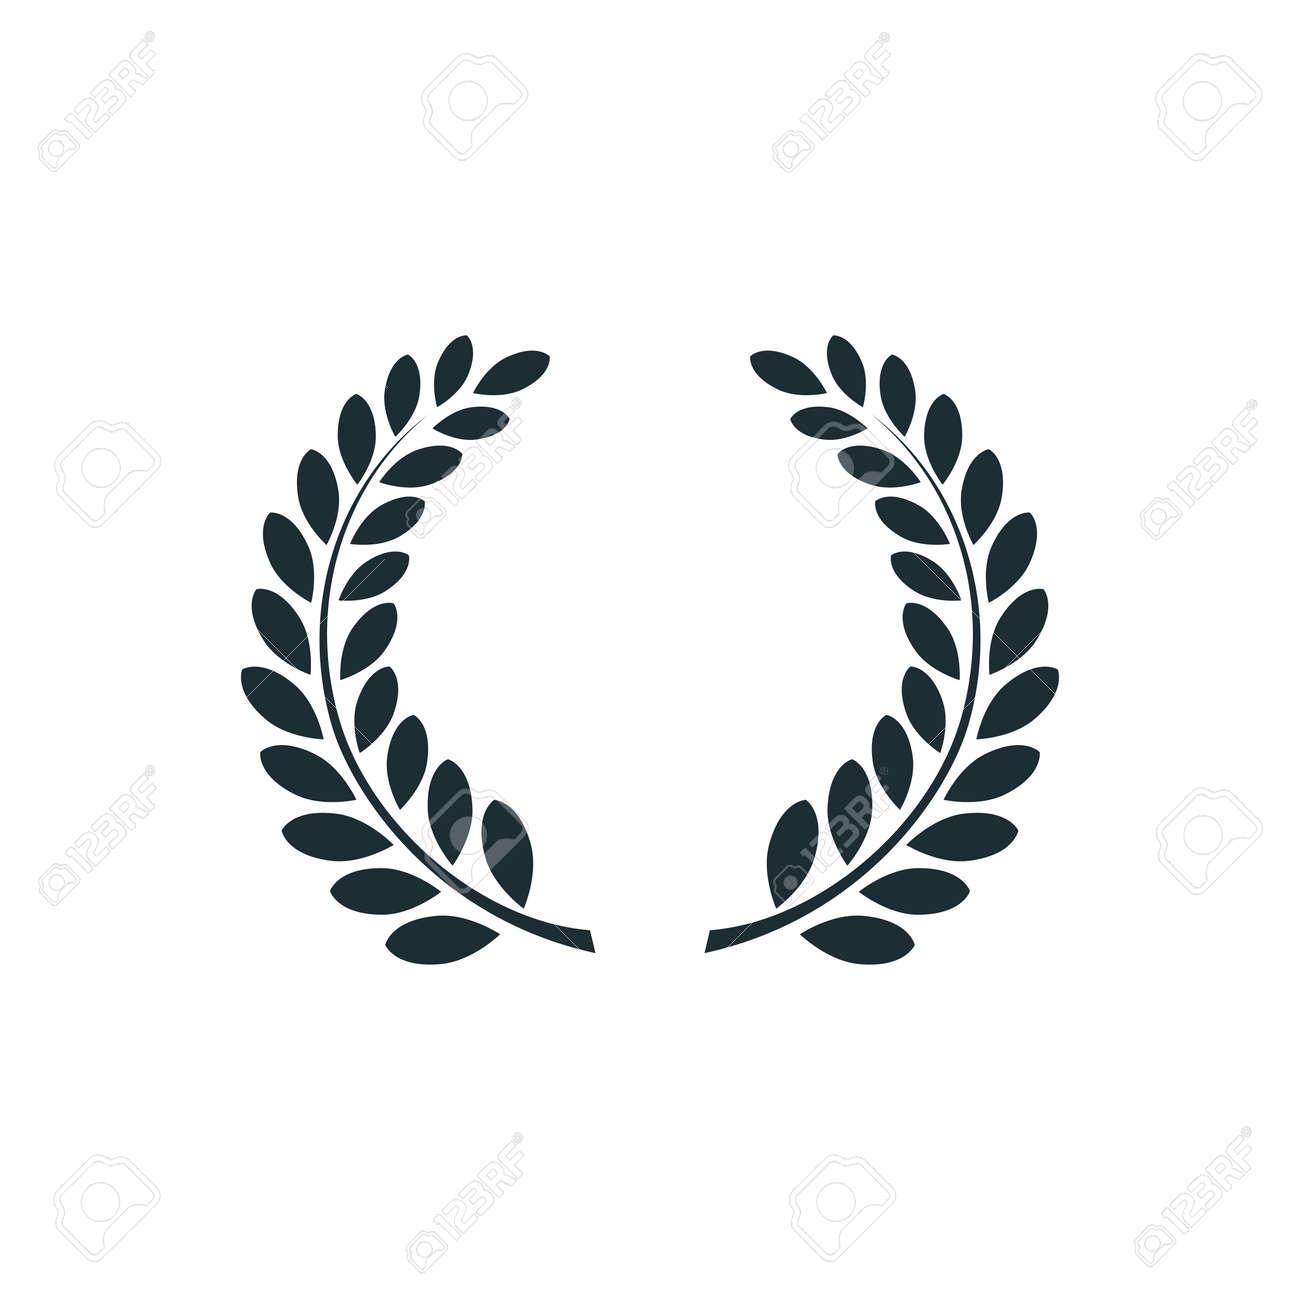 laurel wreath simple concept logo vector illustration royalty rh 123rf com logo vector file logo vector freepik